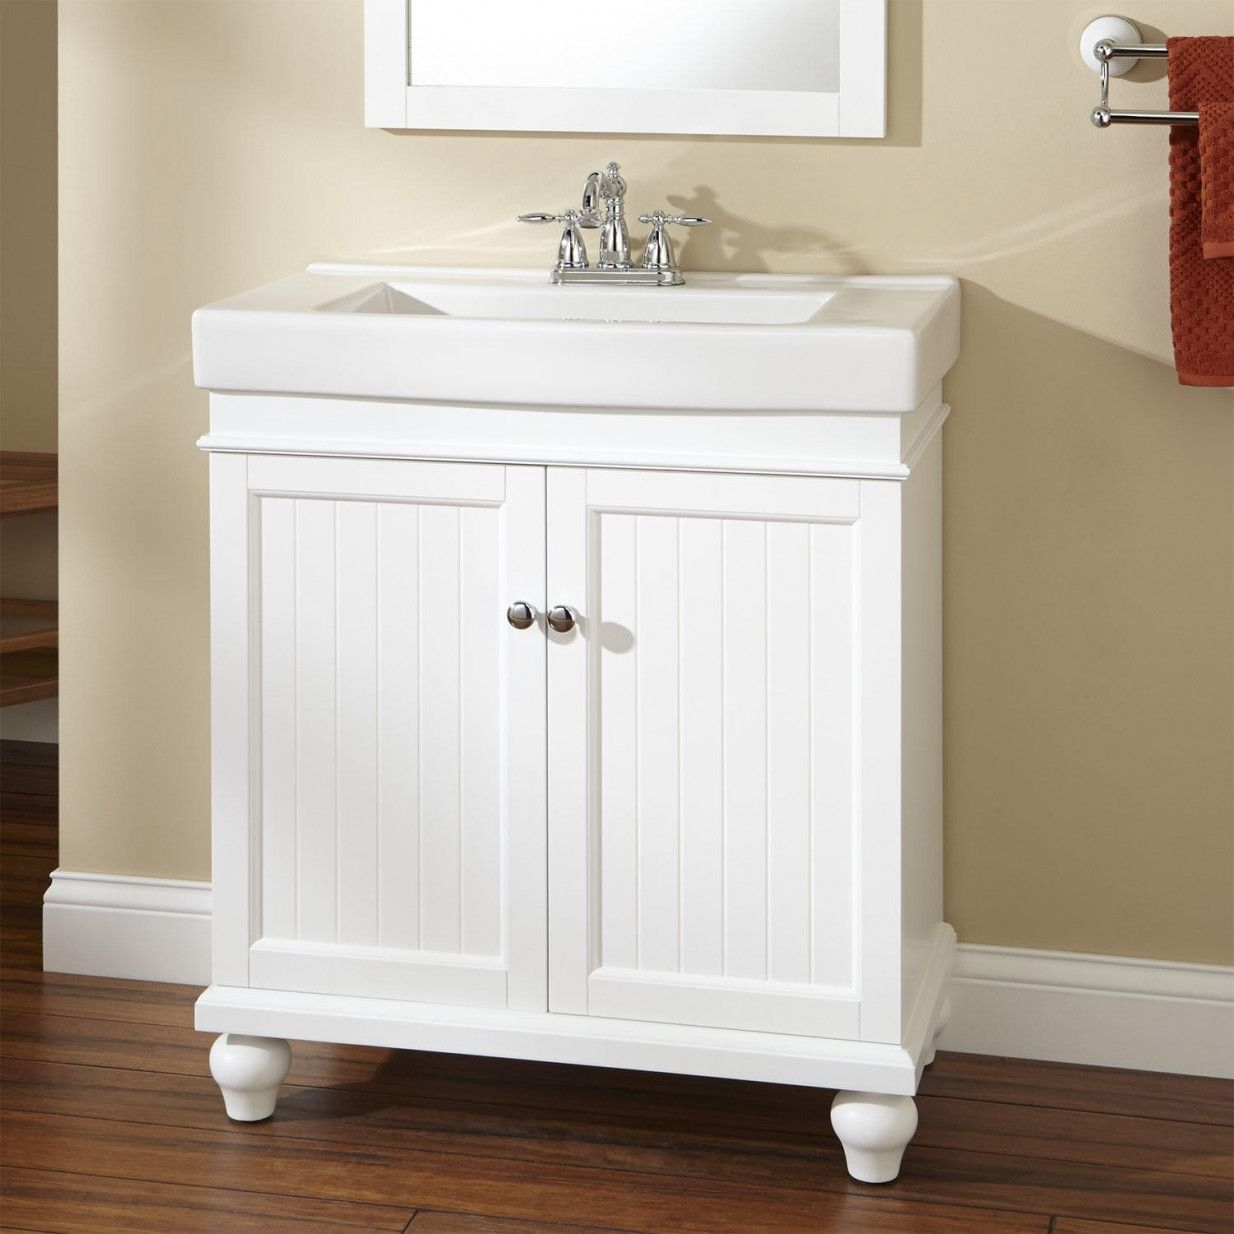 55+ Furniture Bathroom Vanity Neutral Interior